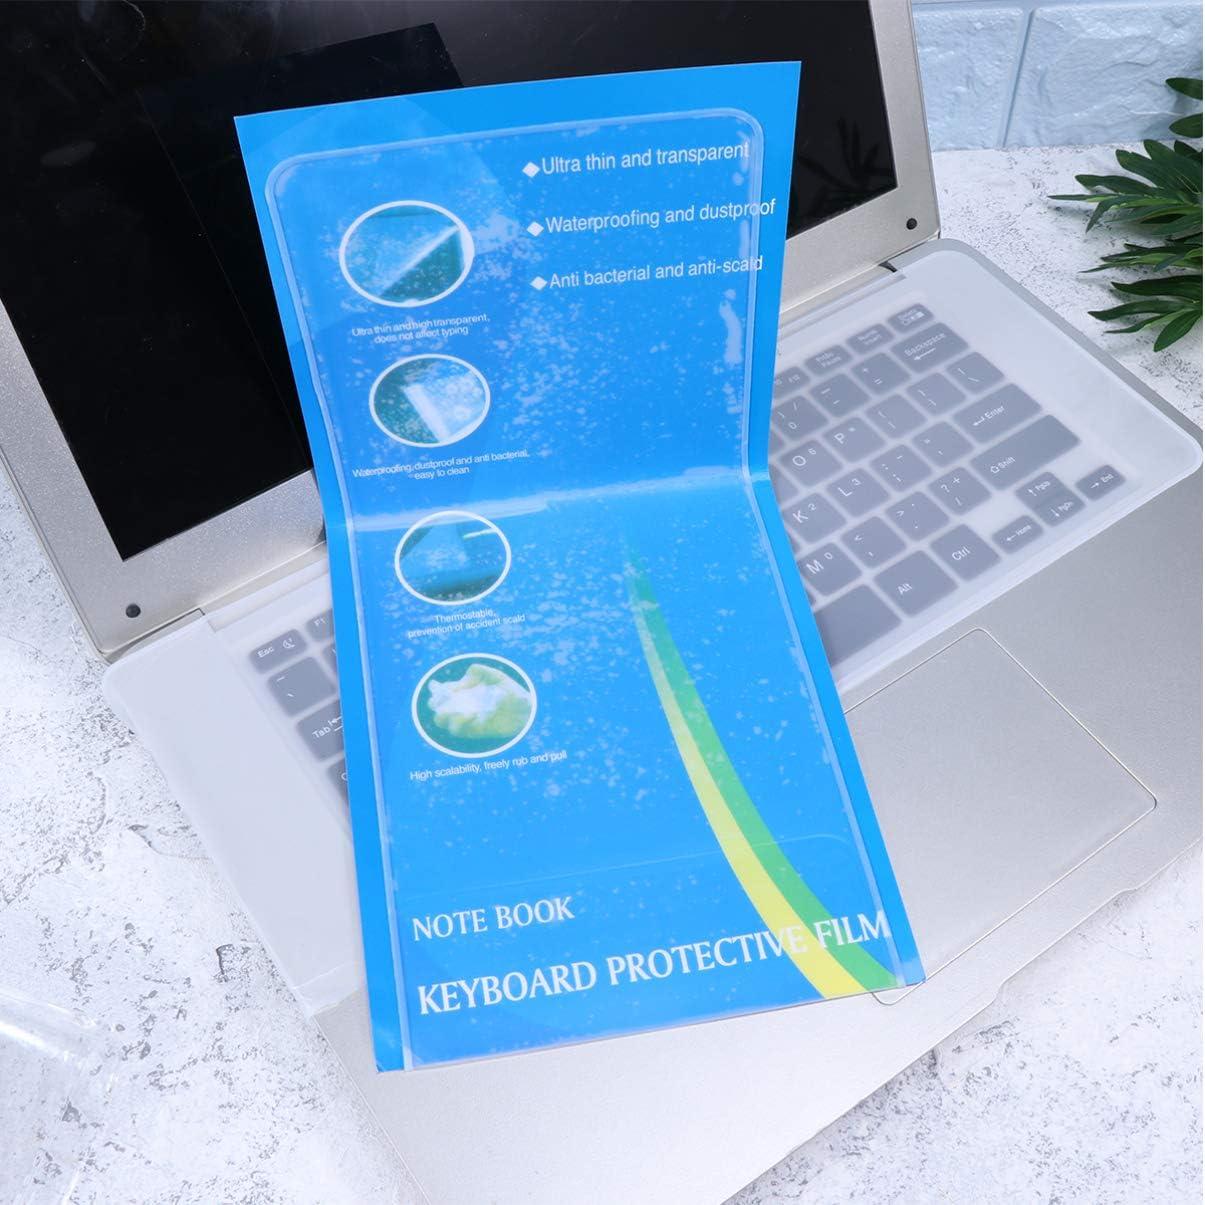 OSALADI 15//17 Clear PC Keyboard Skin Protector Laptop Keyboard Cover Super Thin Keyboard Protector Universal Waterproof Anti-Dust Silicone Keyboard Skin Cover 5pcs